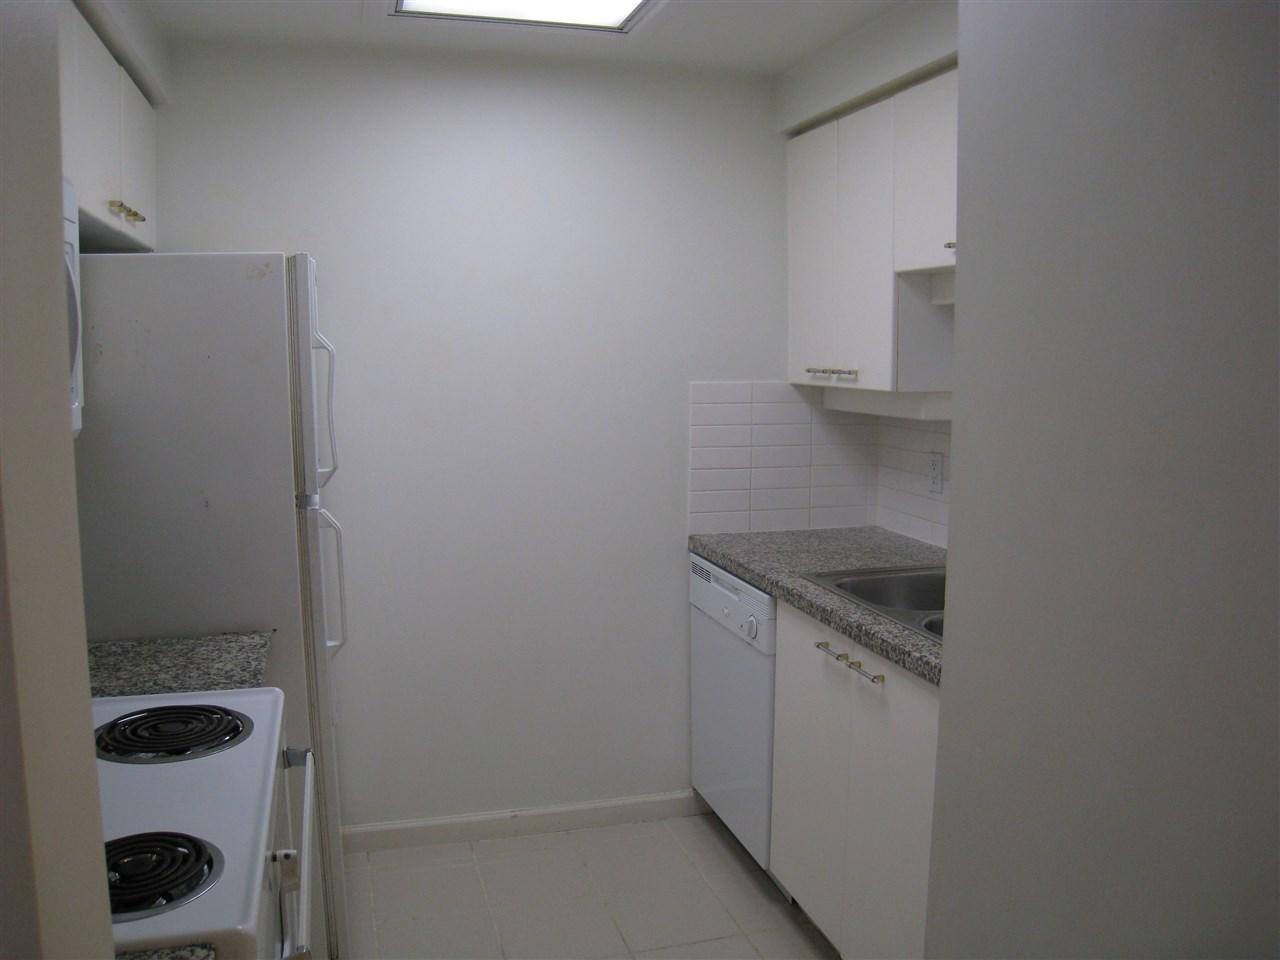 Condo Apartment at 1305 388 DRAKE STREET, Unit 1305, Vancouver West, British Columbia. Image 4